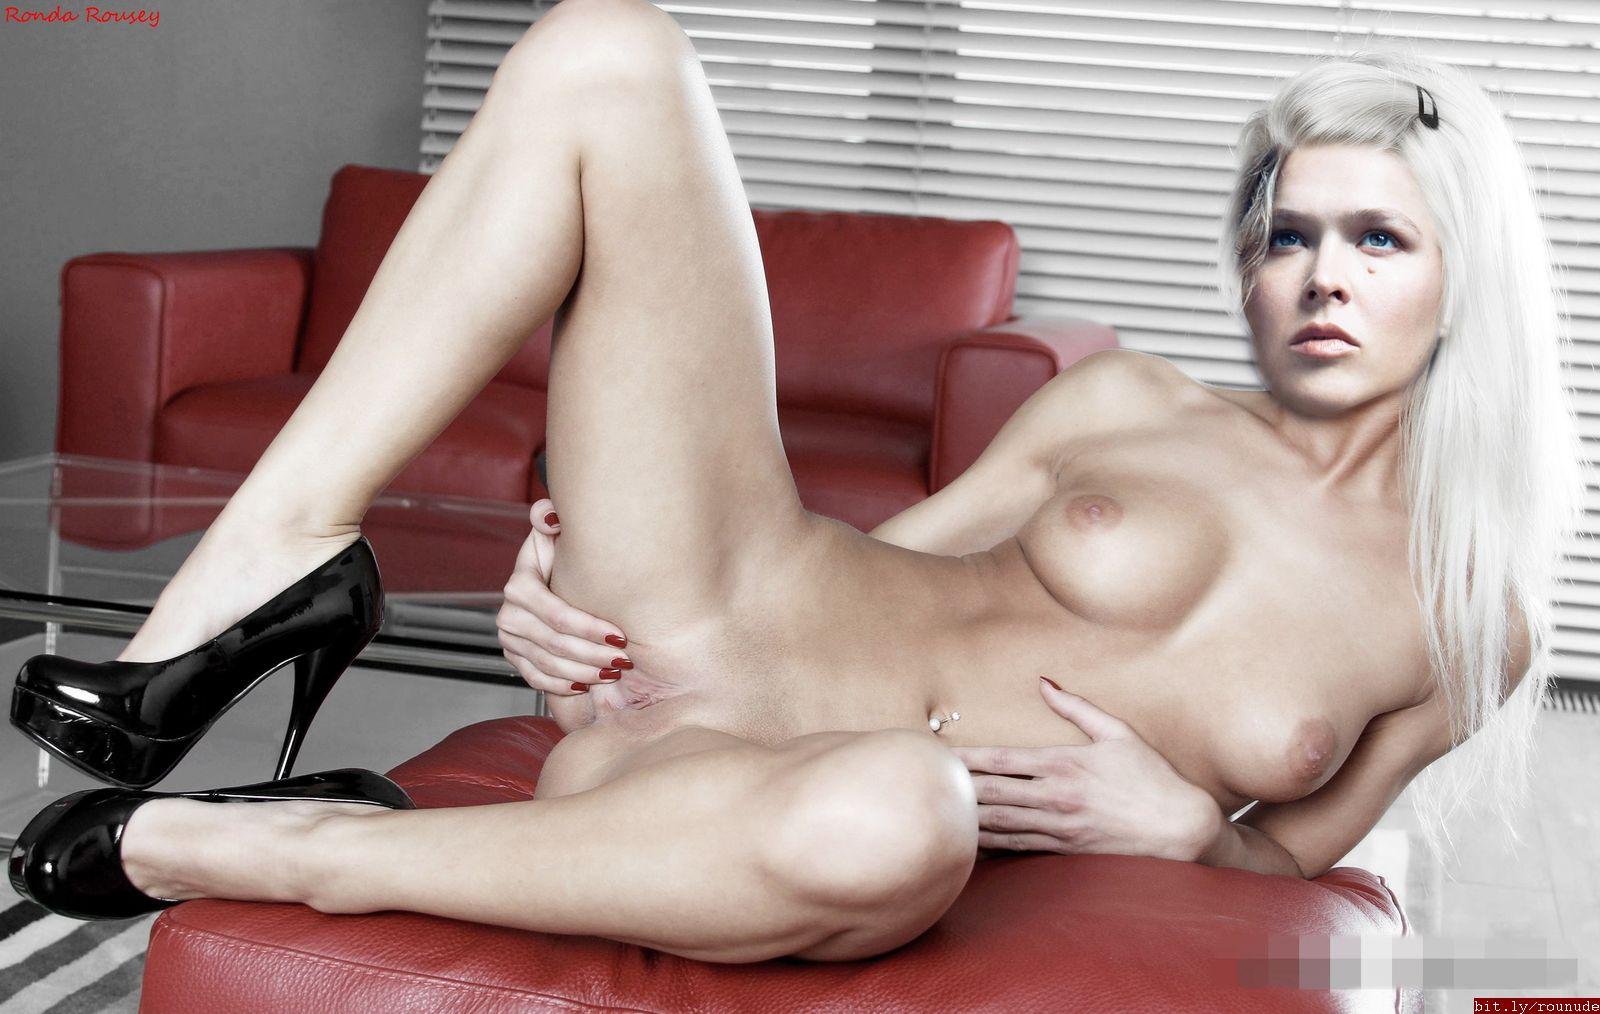 Nude beach galleries